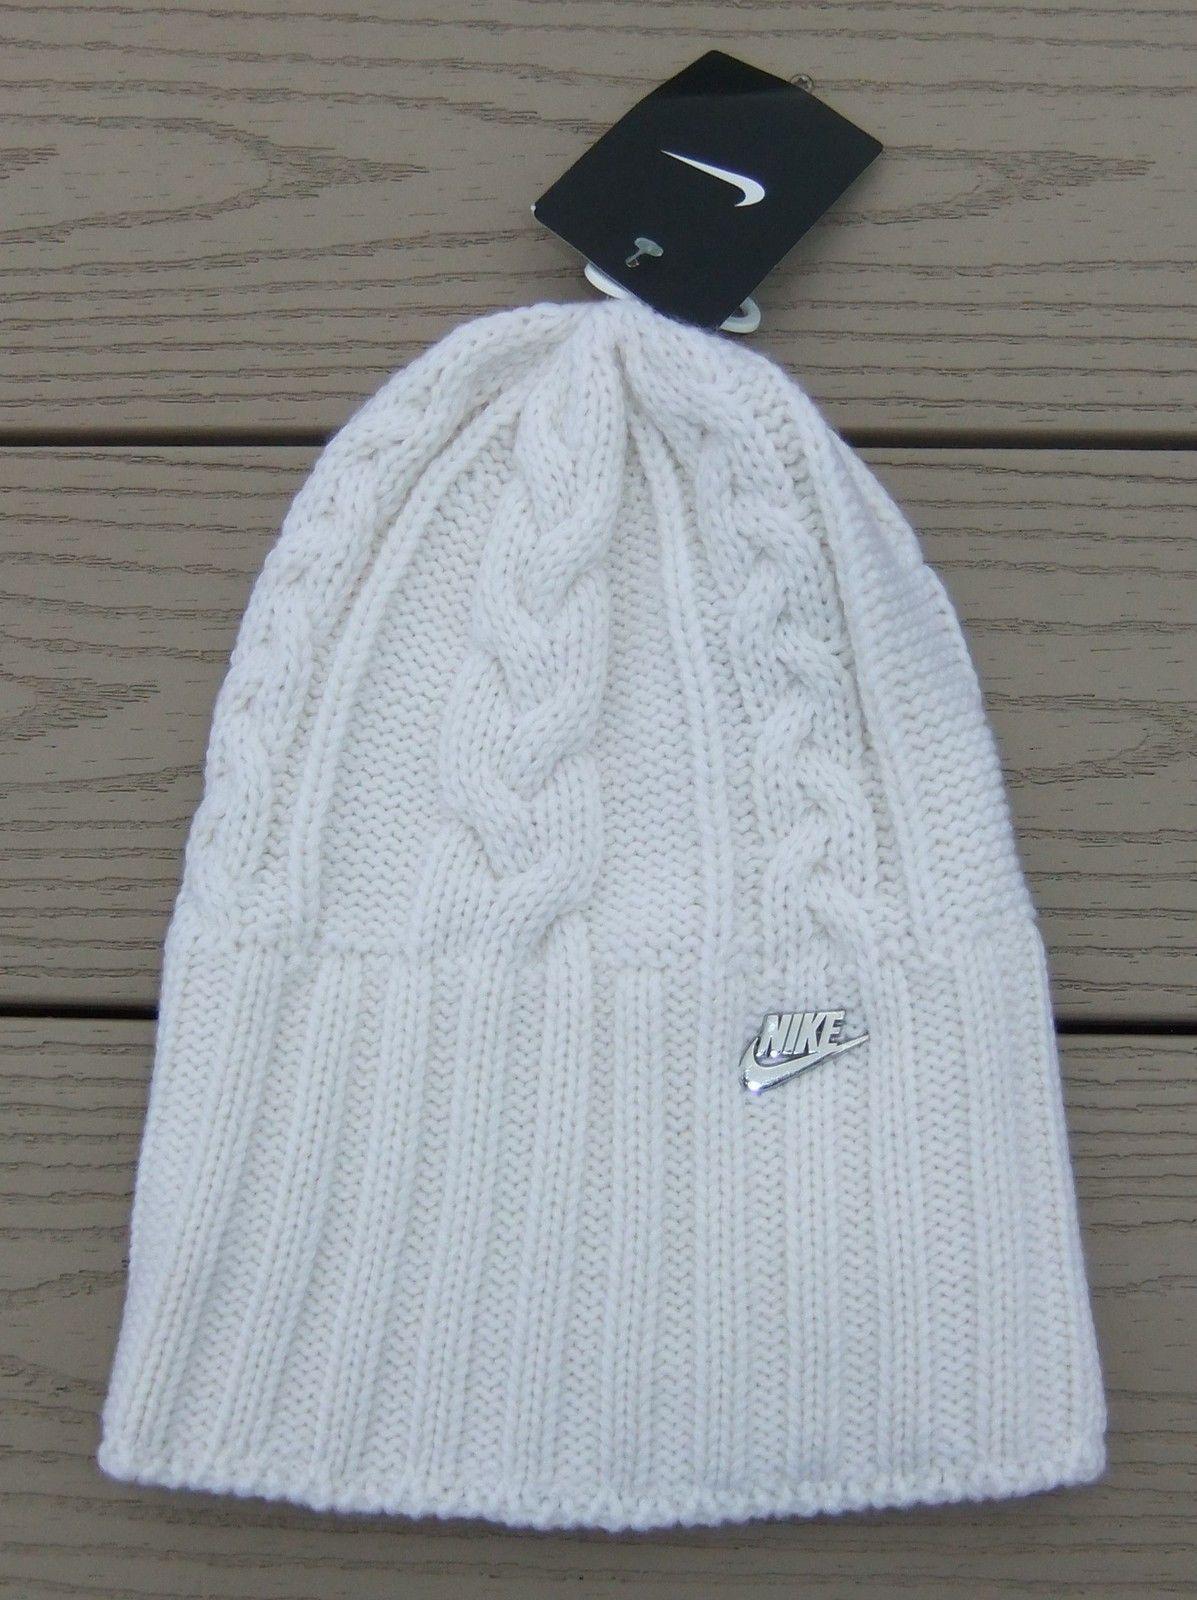 688930da9bb Nwt Nike Cable Knit Womens Fleece Lined Beanie Hat-Osfm Ret  30 Ivory White